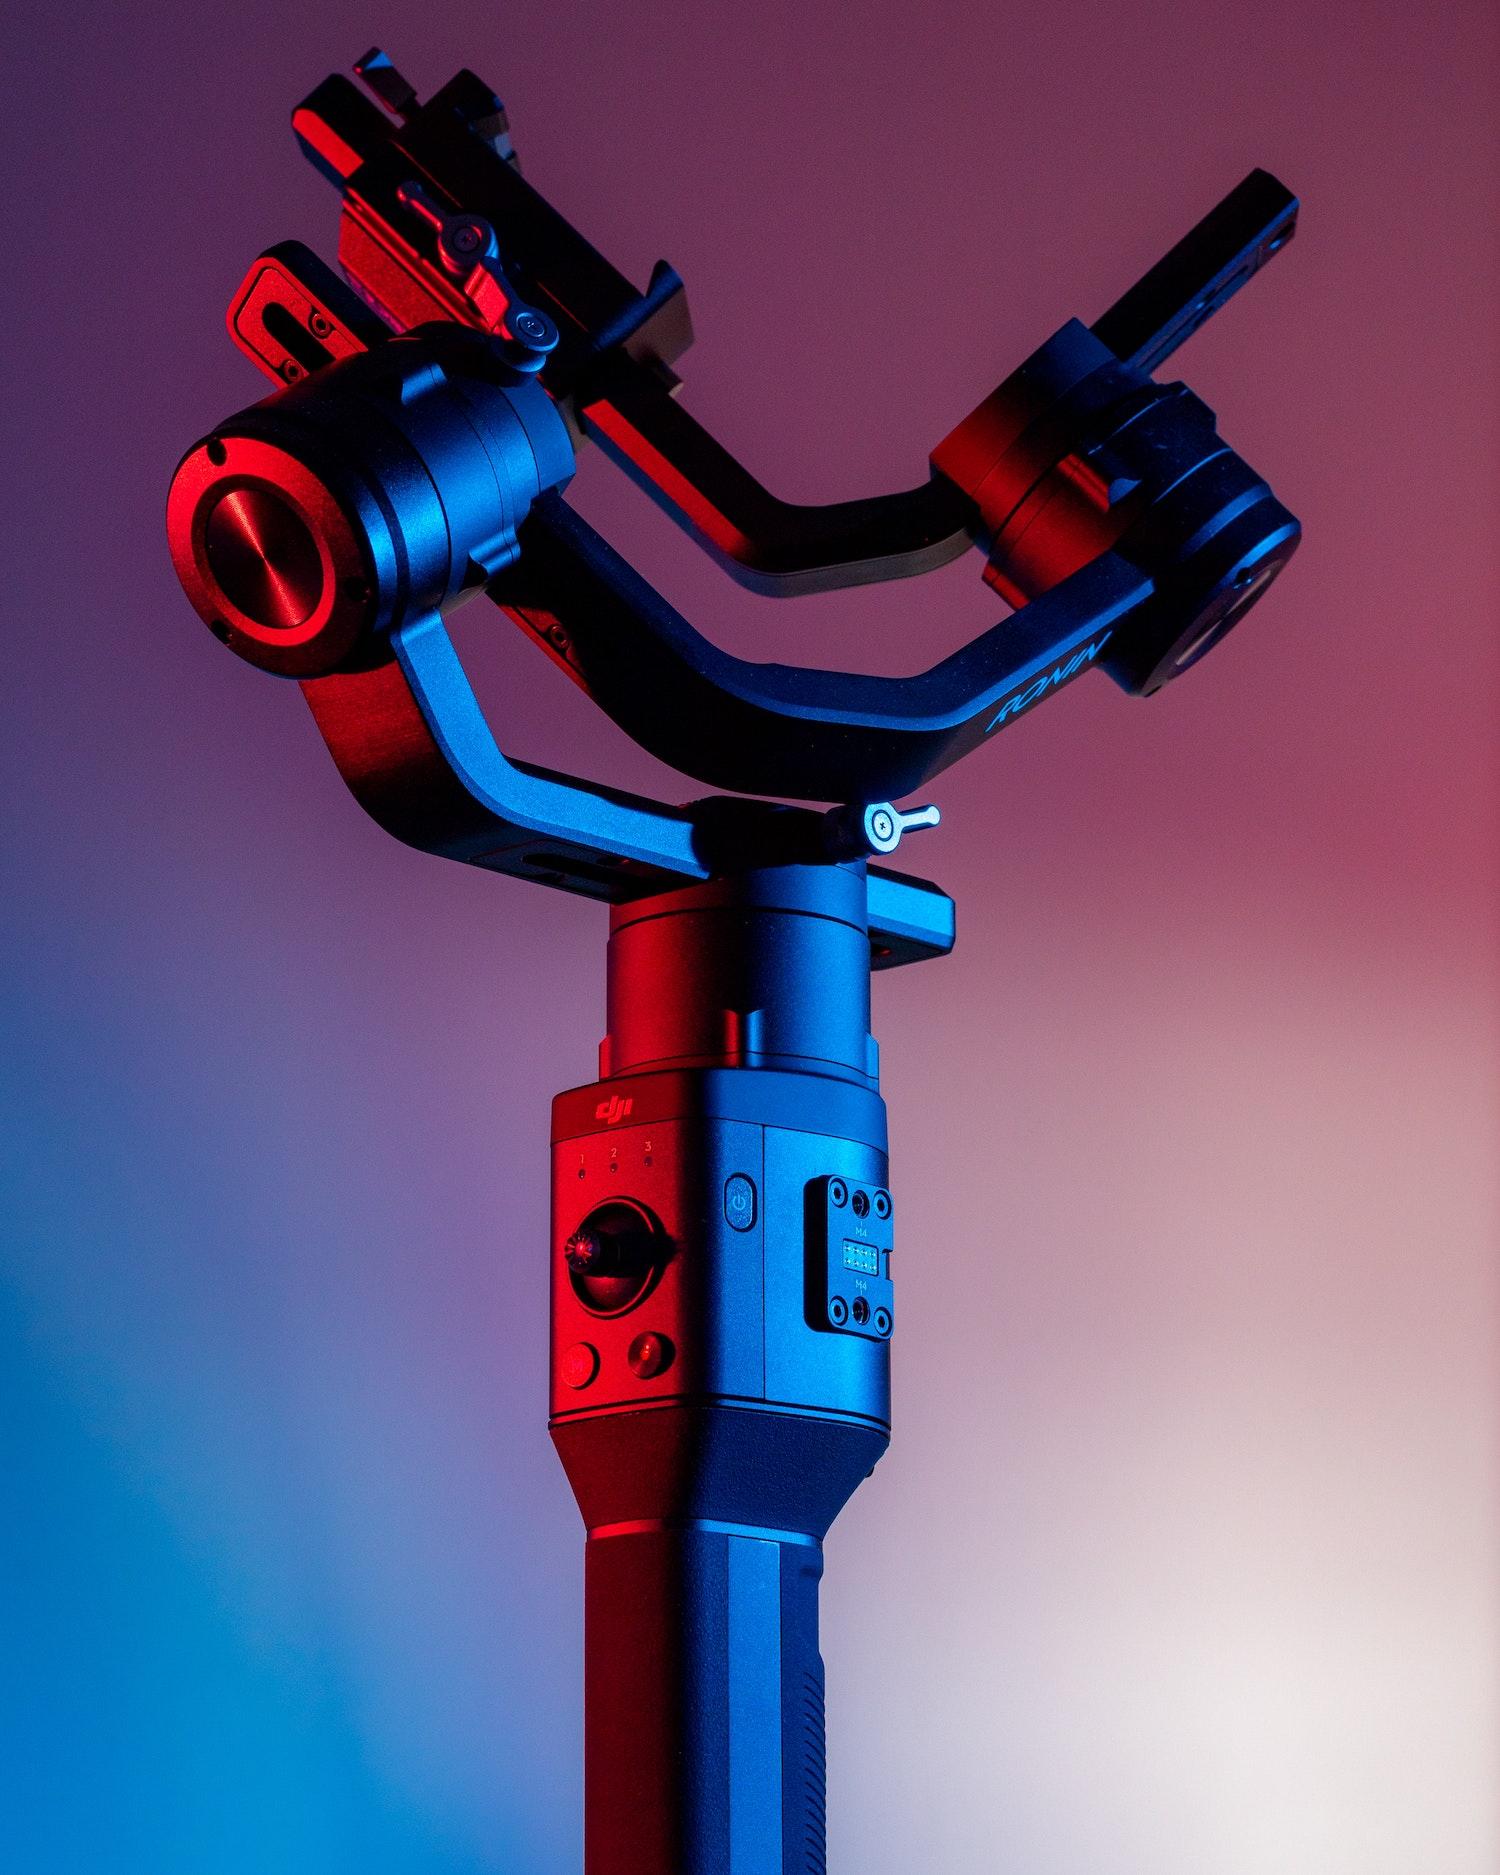 Rent the DJI ronin S gimbal kit in Berlin for cheap